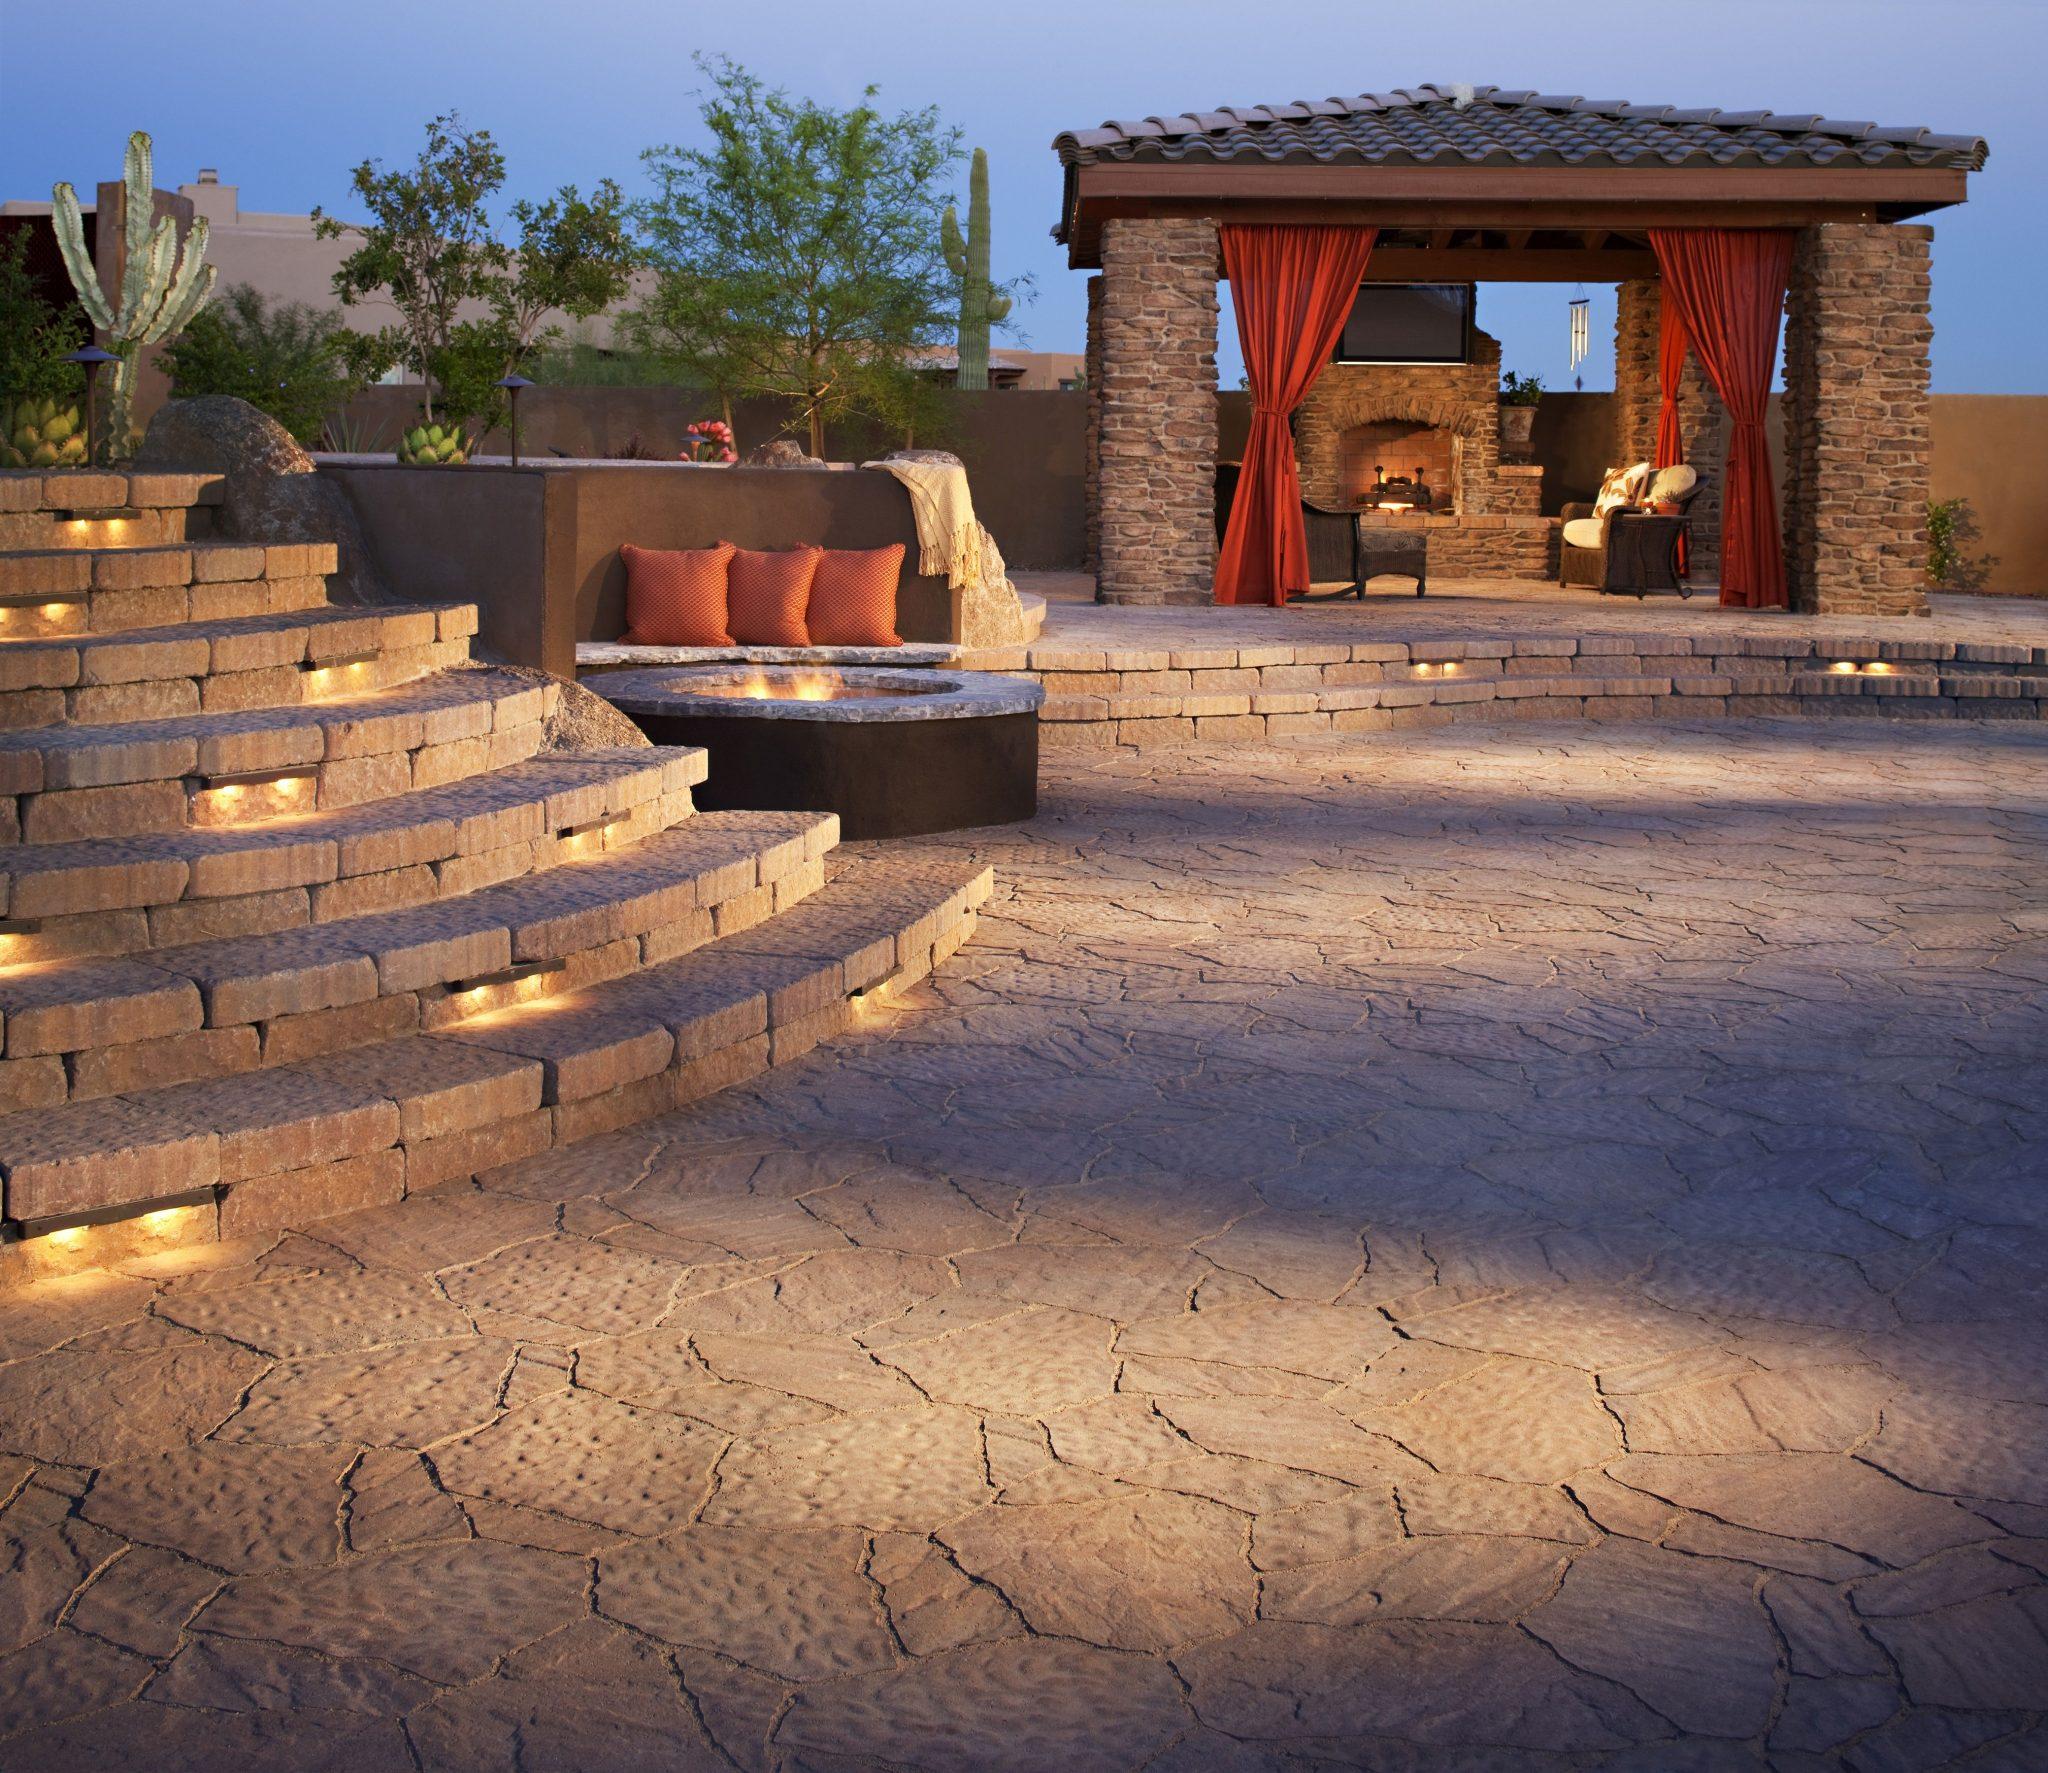 Downlighting on Paving Stone Steps